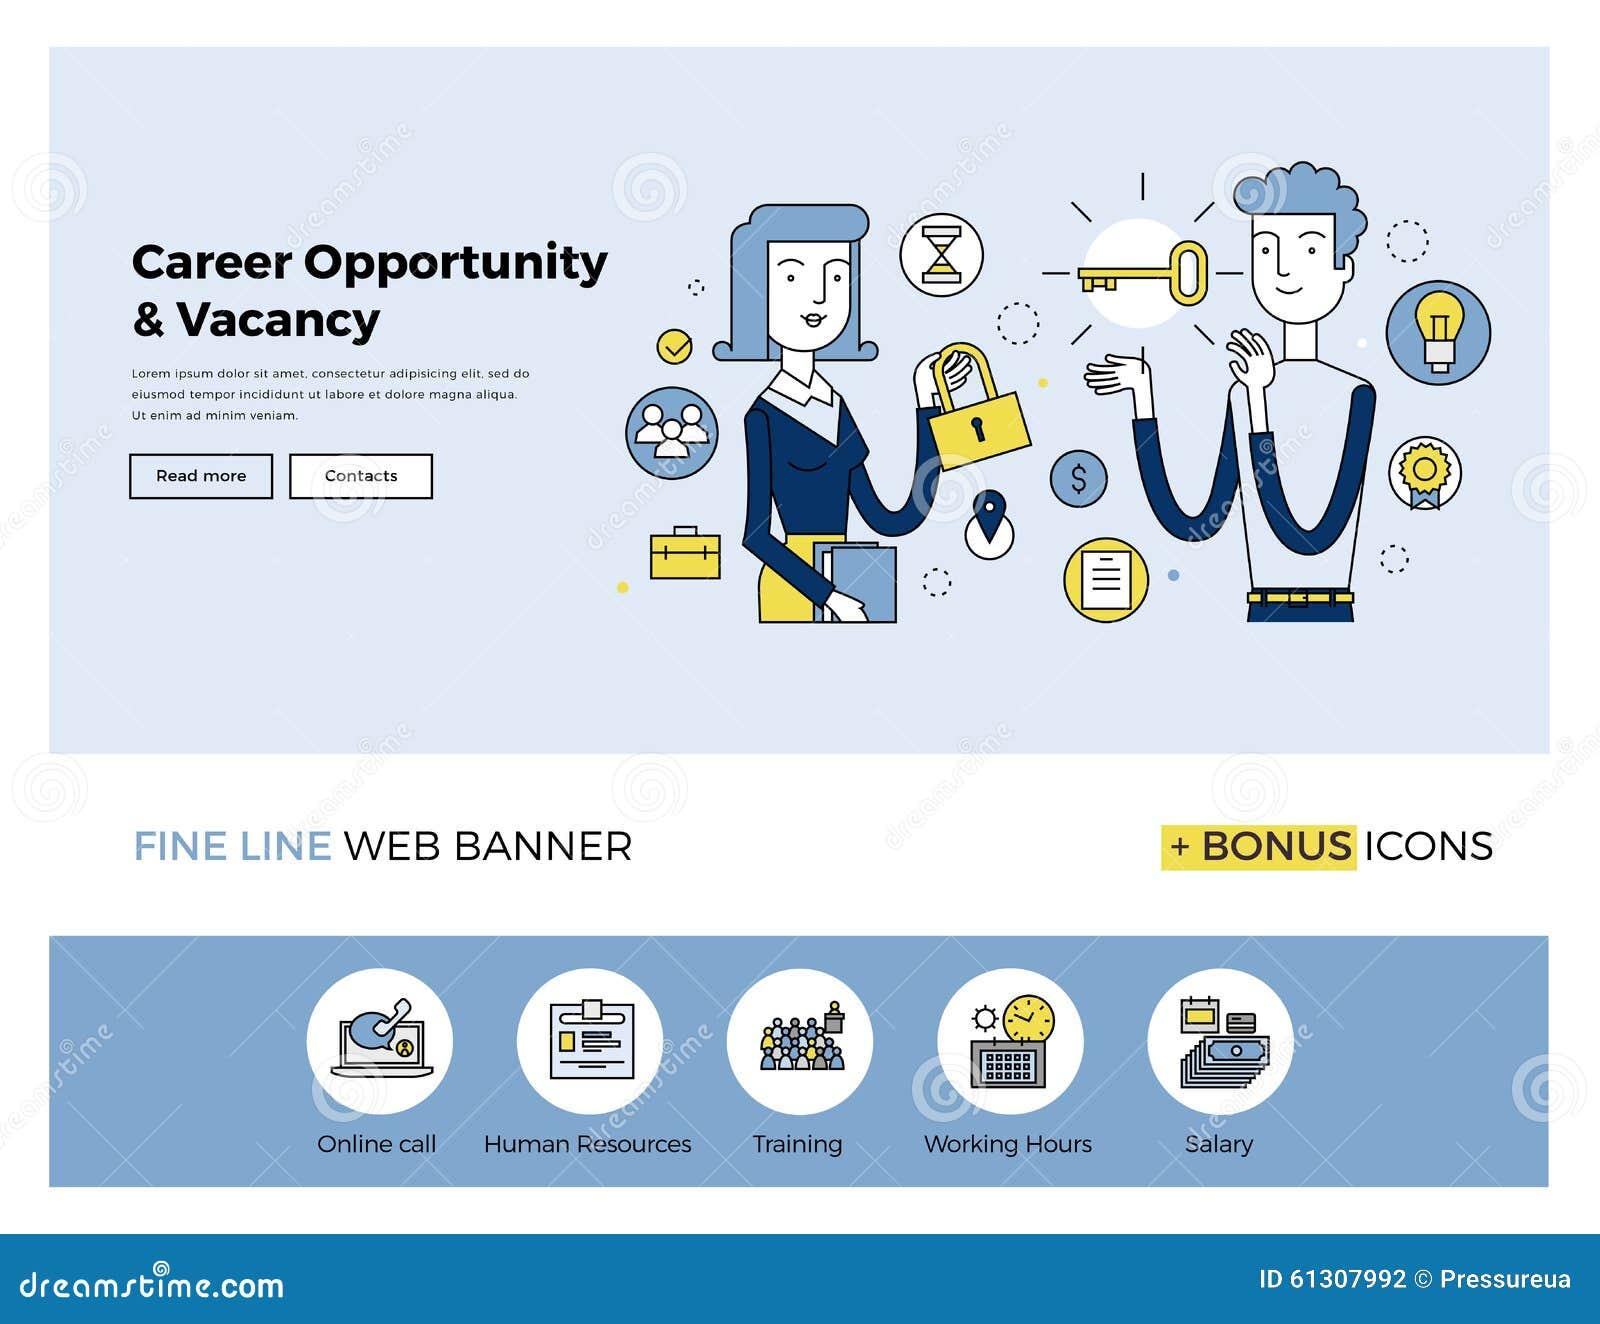 Human Resources best technology majors